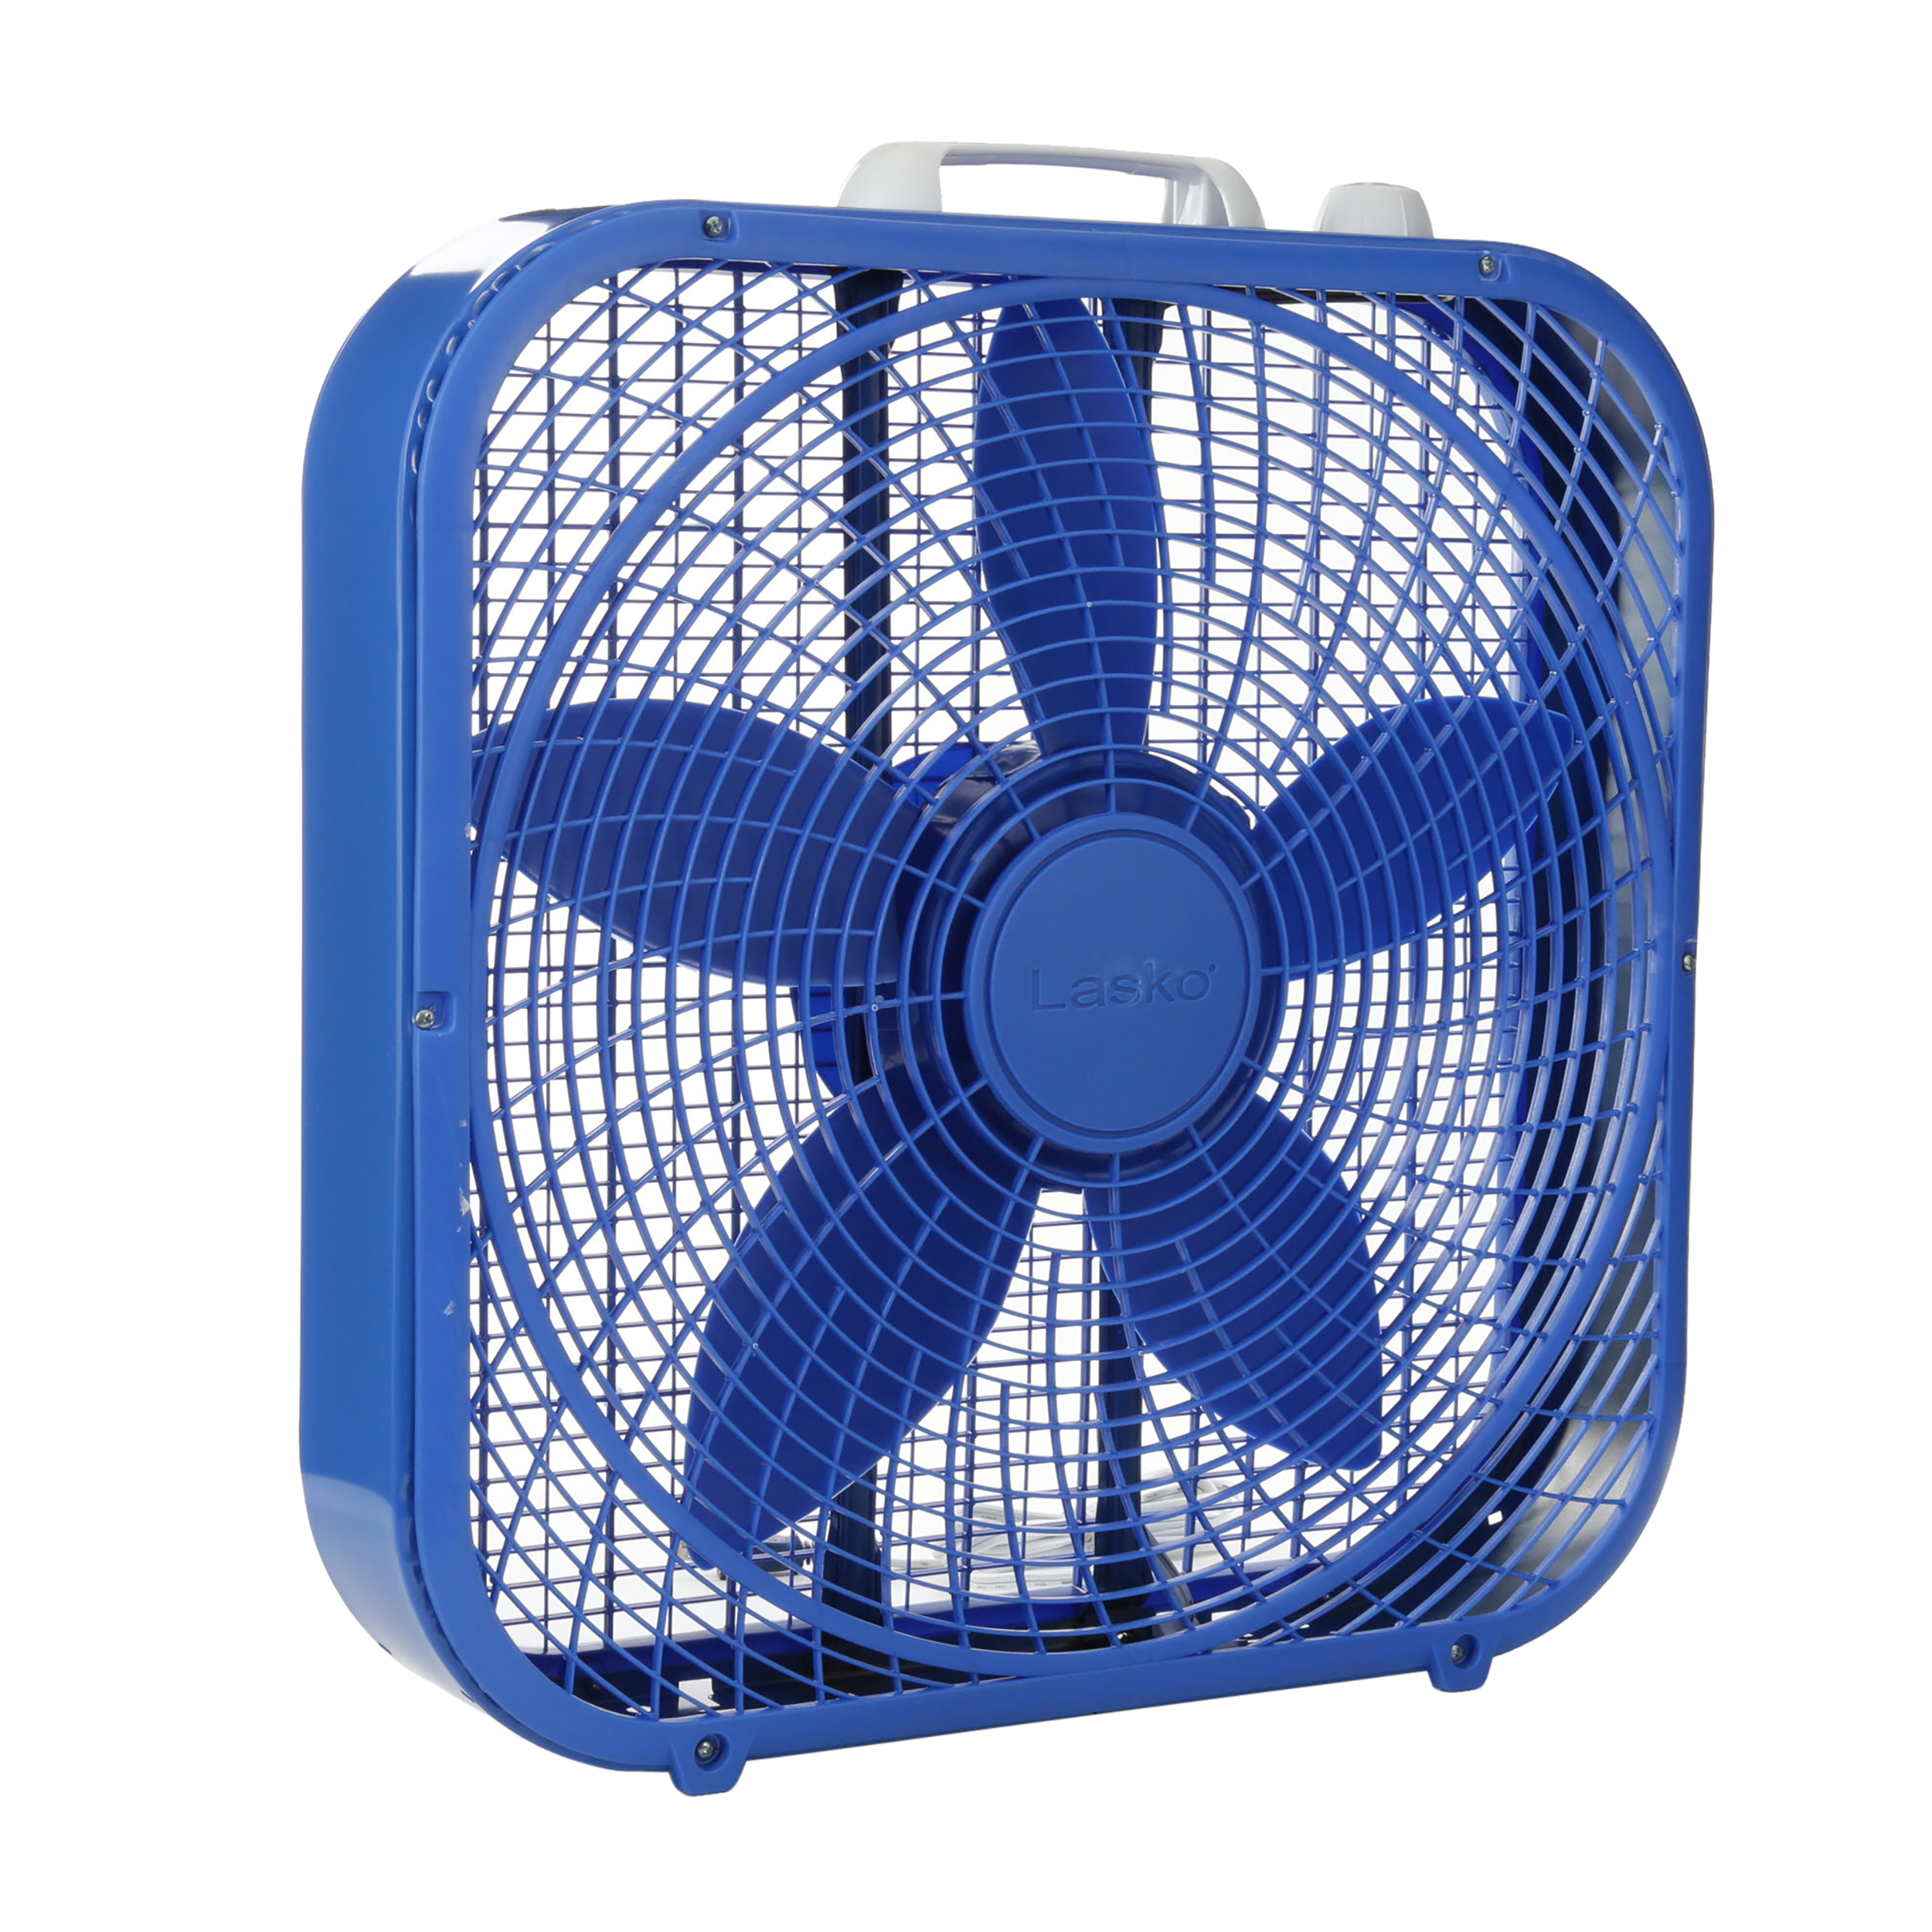 "Lasko Cool Colors 20"" Box 3-Speed Fan, Model #B20301, Black - Walmart.com"